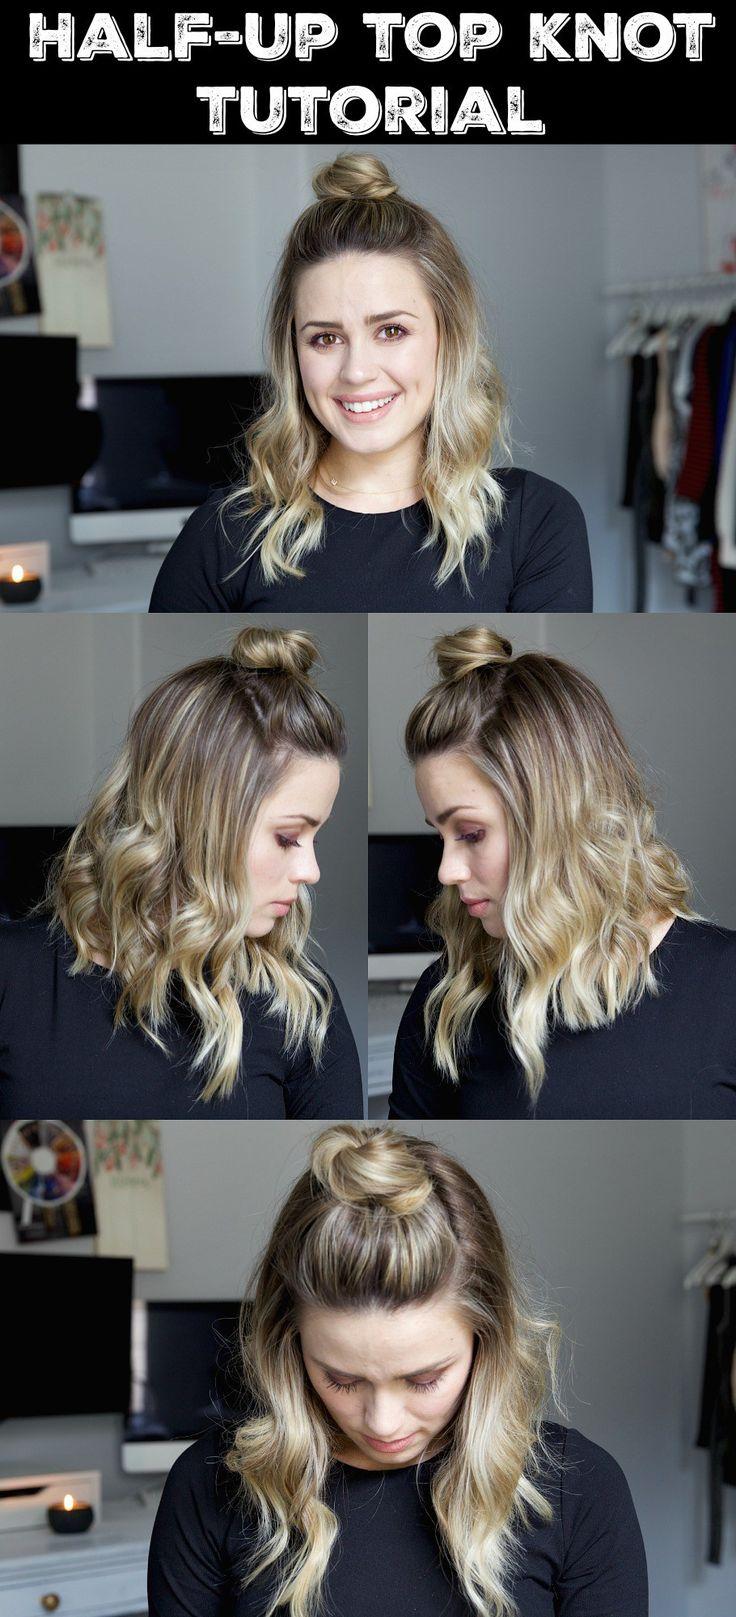 Half Up Top Knot Tutorial | Short Hair | Short hair tutorial | Wavy hair tutoria...